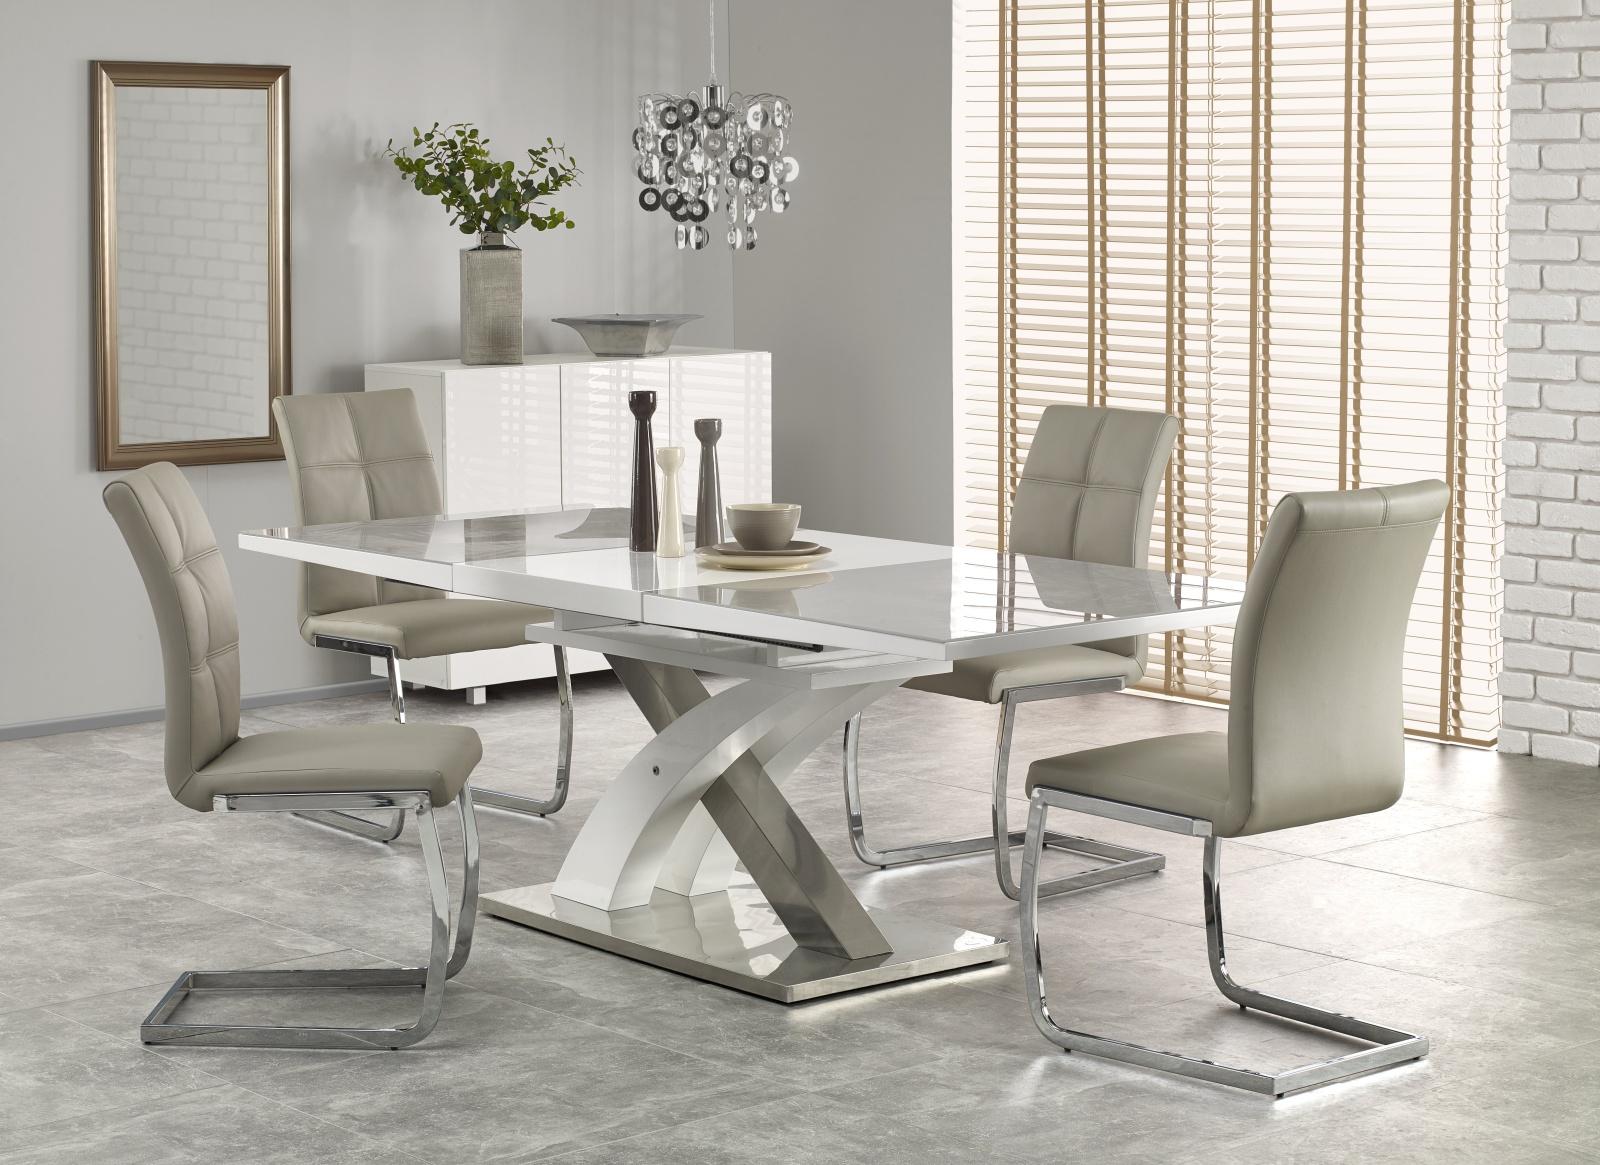 Halmar Jídelní stůl rozkládací SANDOR 2, 160/220x90 cm, šedý